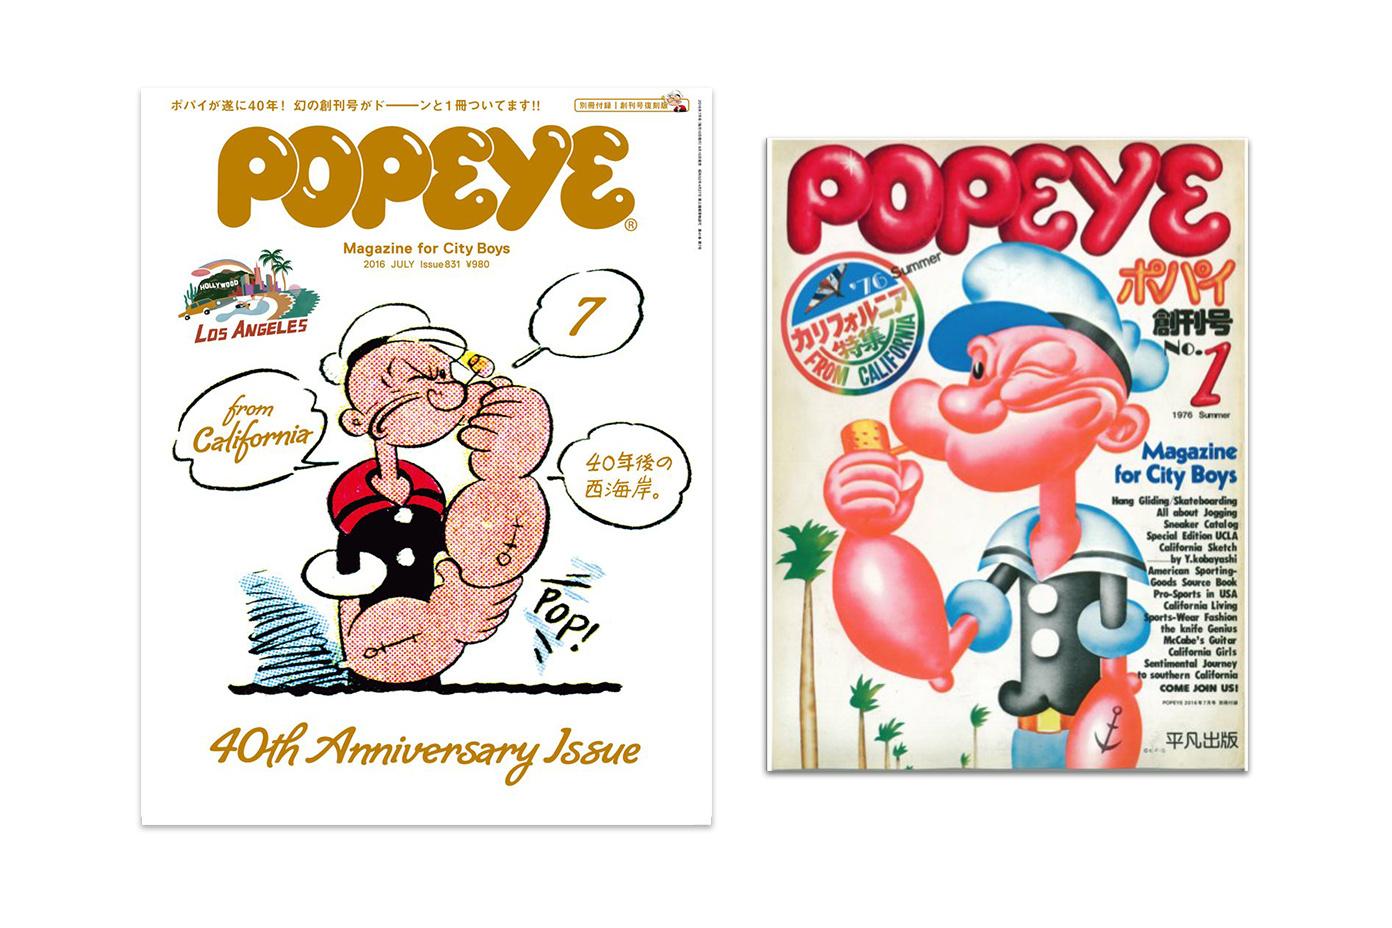 'POPEYE' Magazine Celebrates 40 Years of Print This July